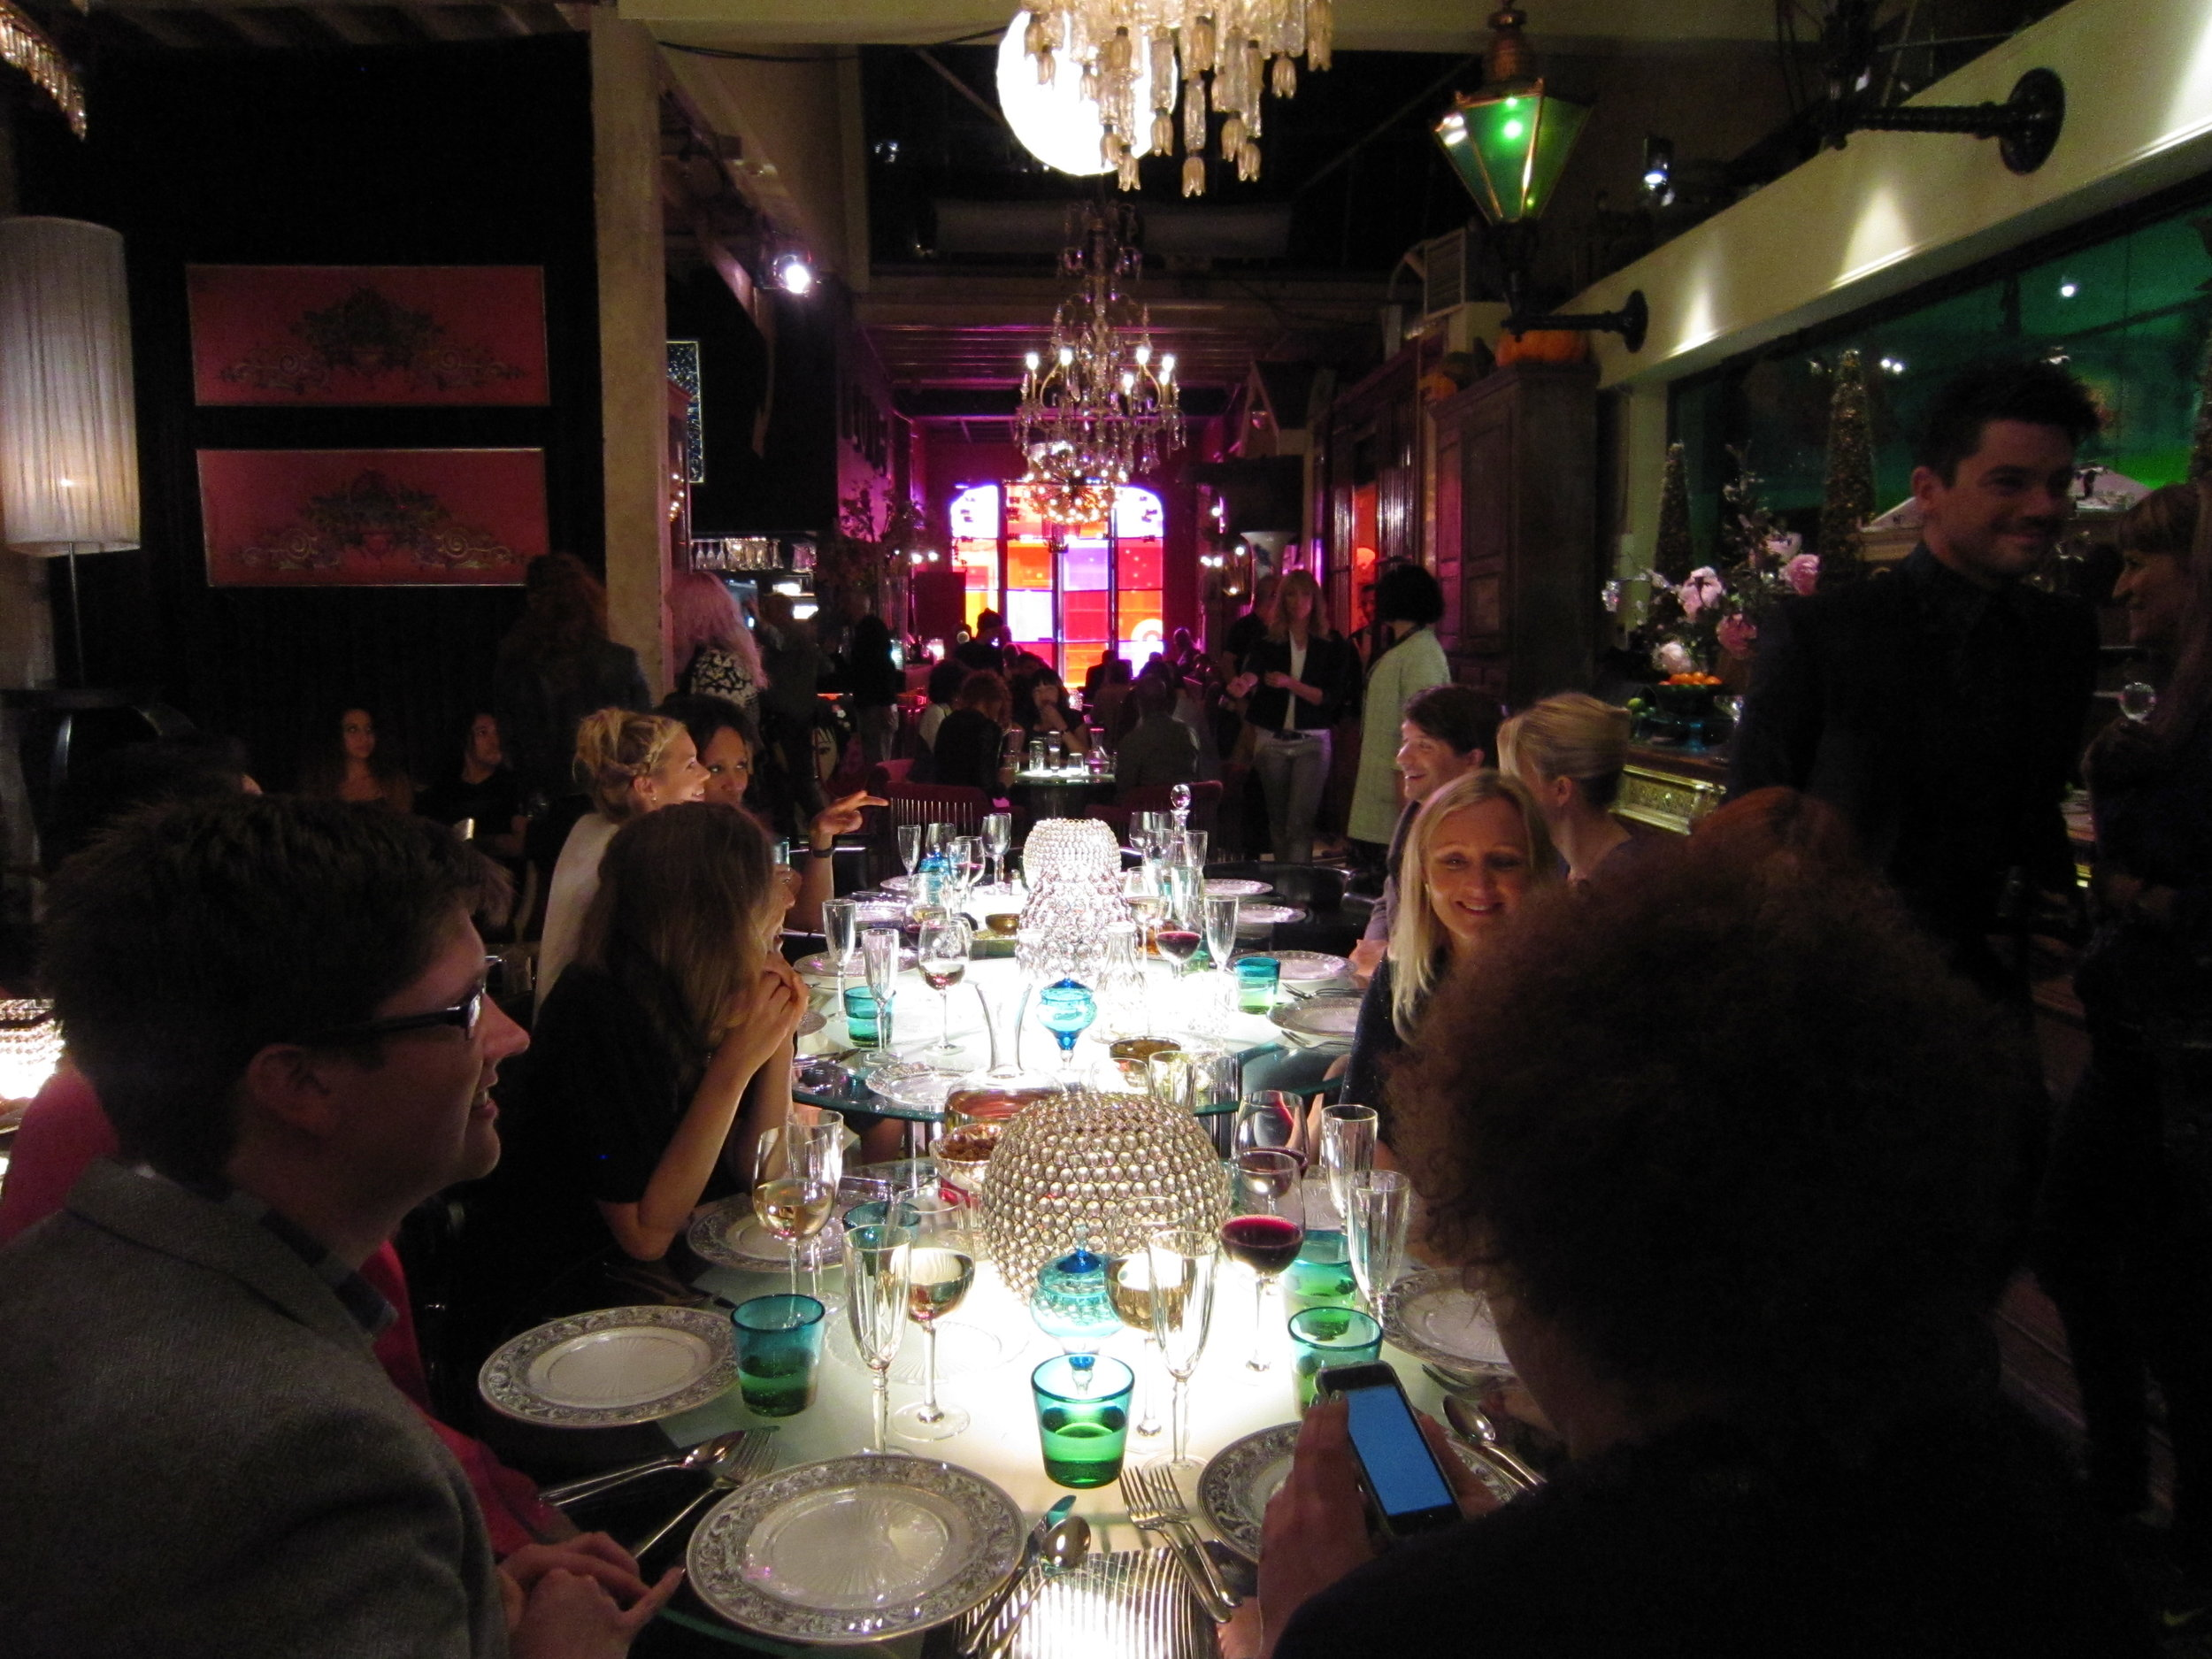 restaurant party.JPG